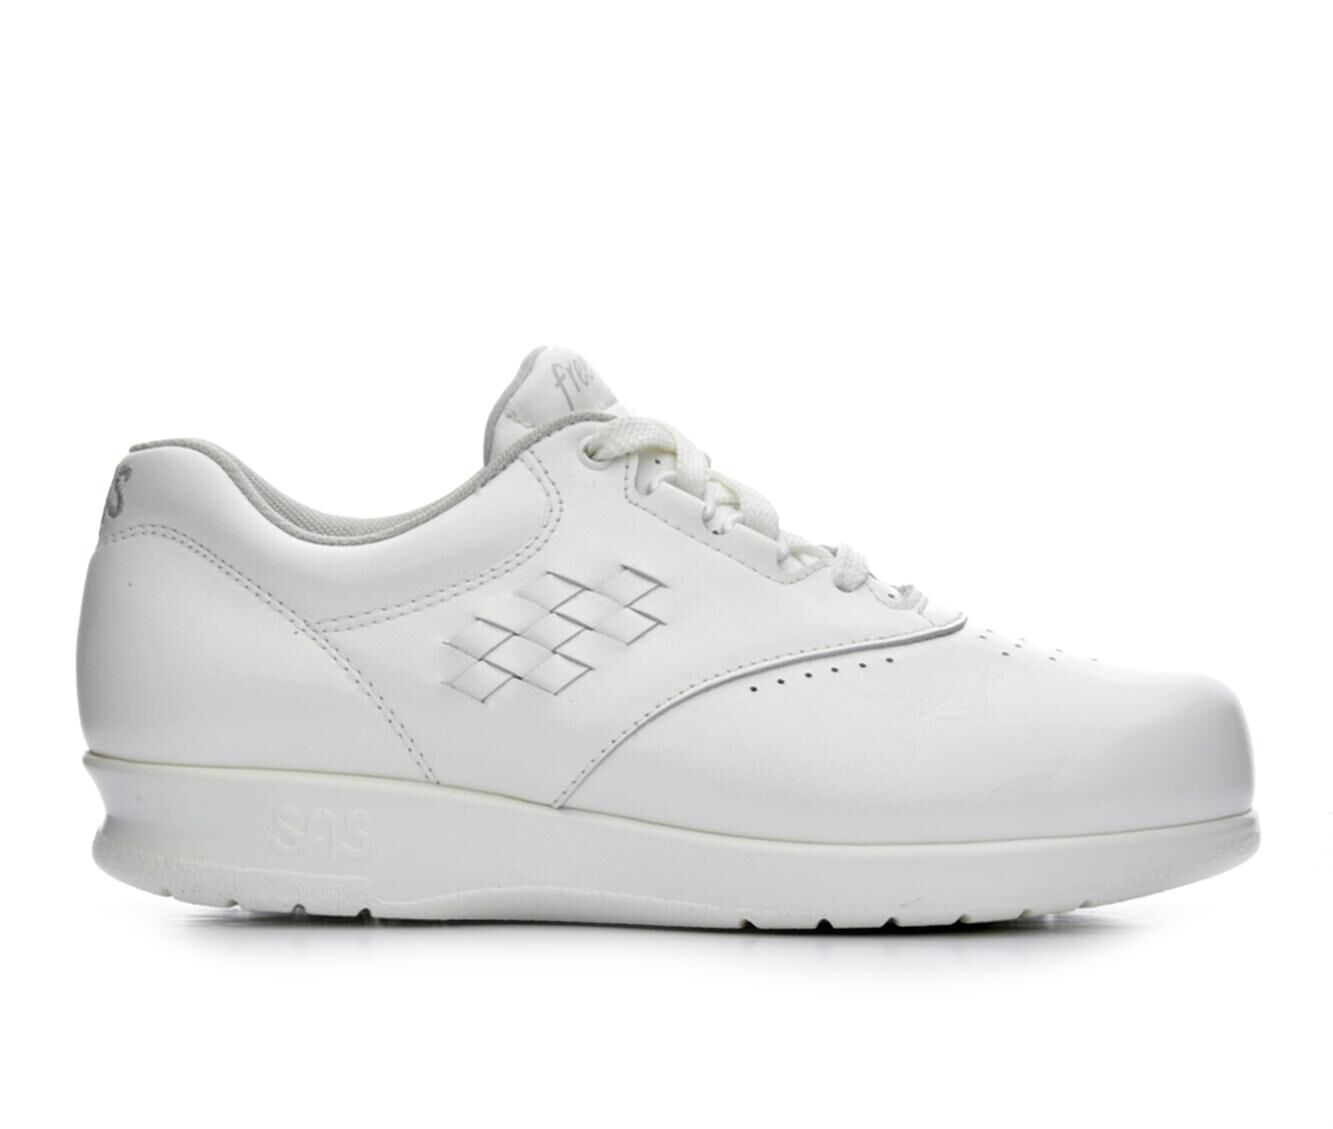 The Cheapest Price Women's Sas Freetime Comfort W Walking Shoes White